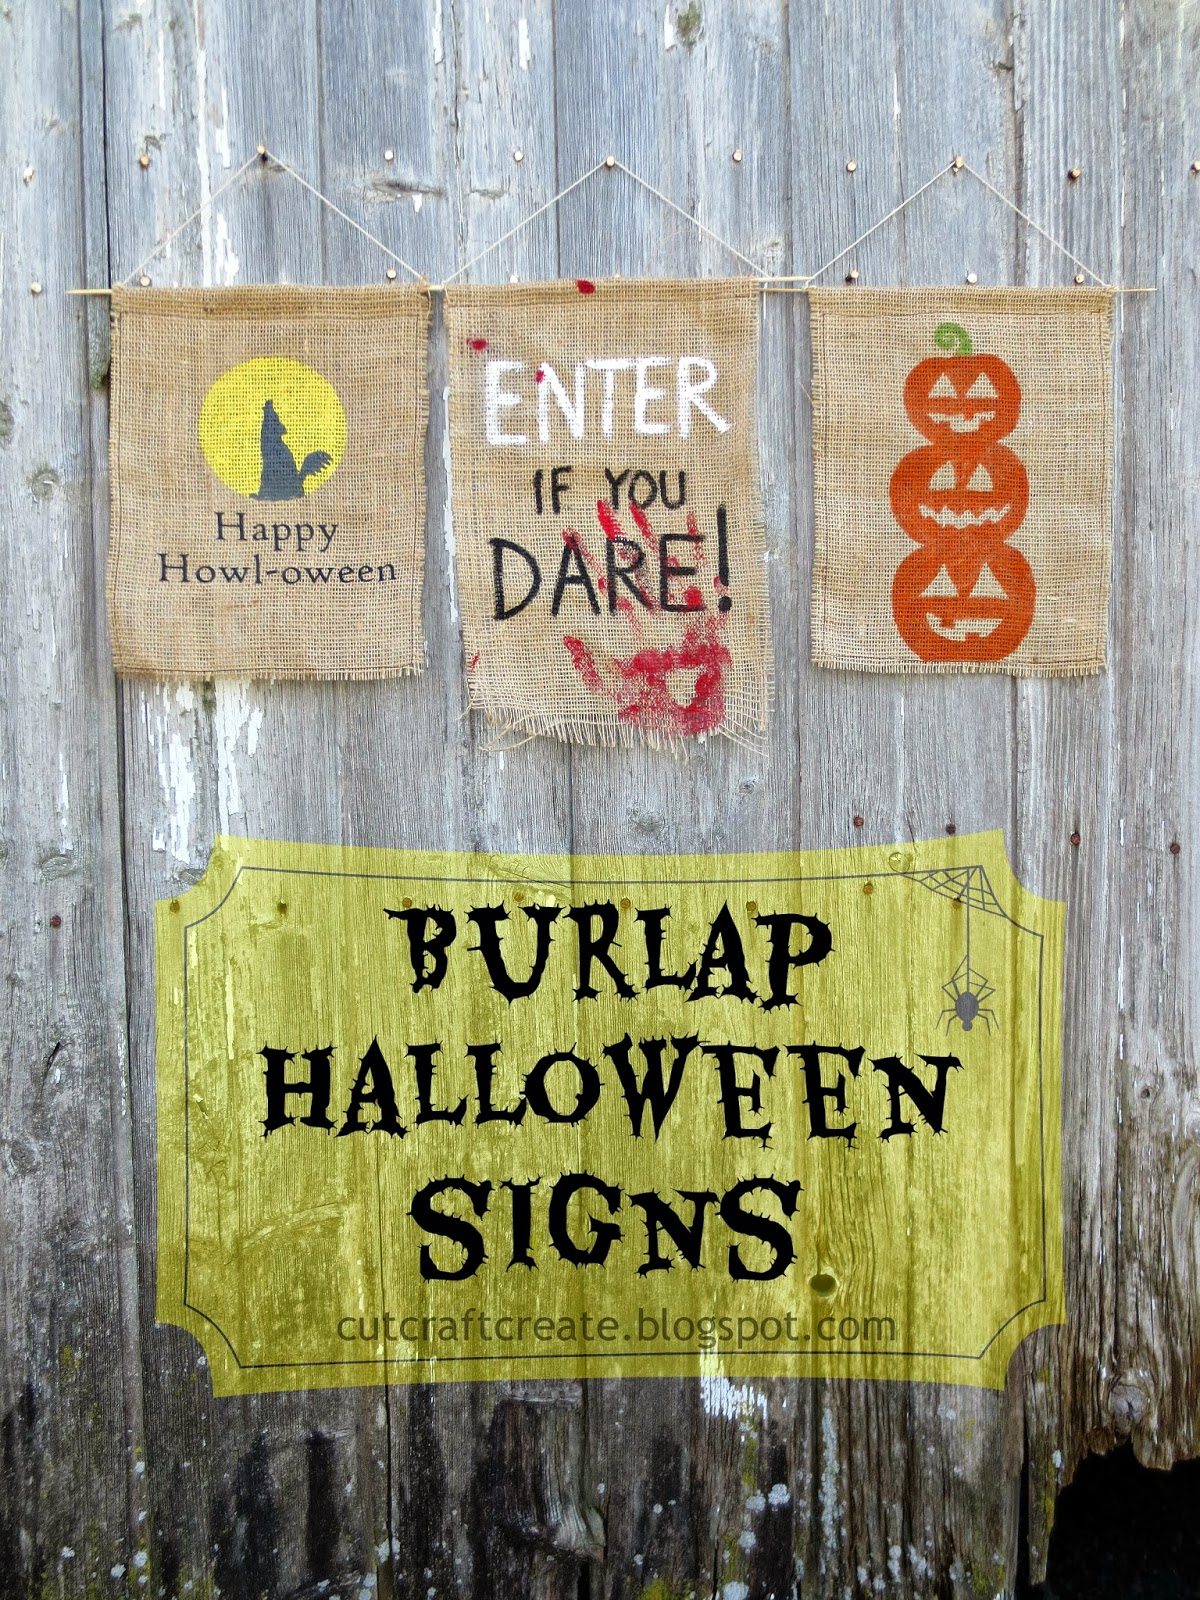 Cut Craft Create Burlap Halloween Signs Plus Halloween